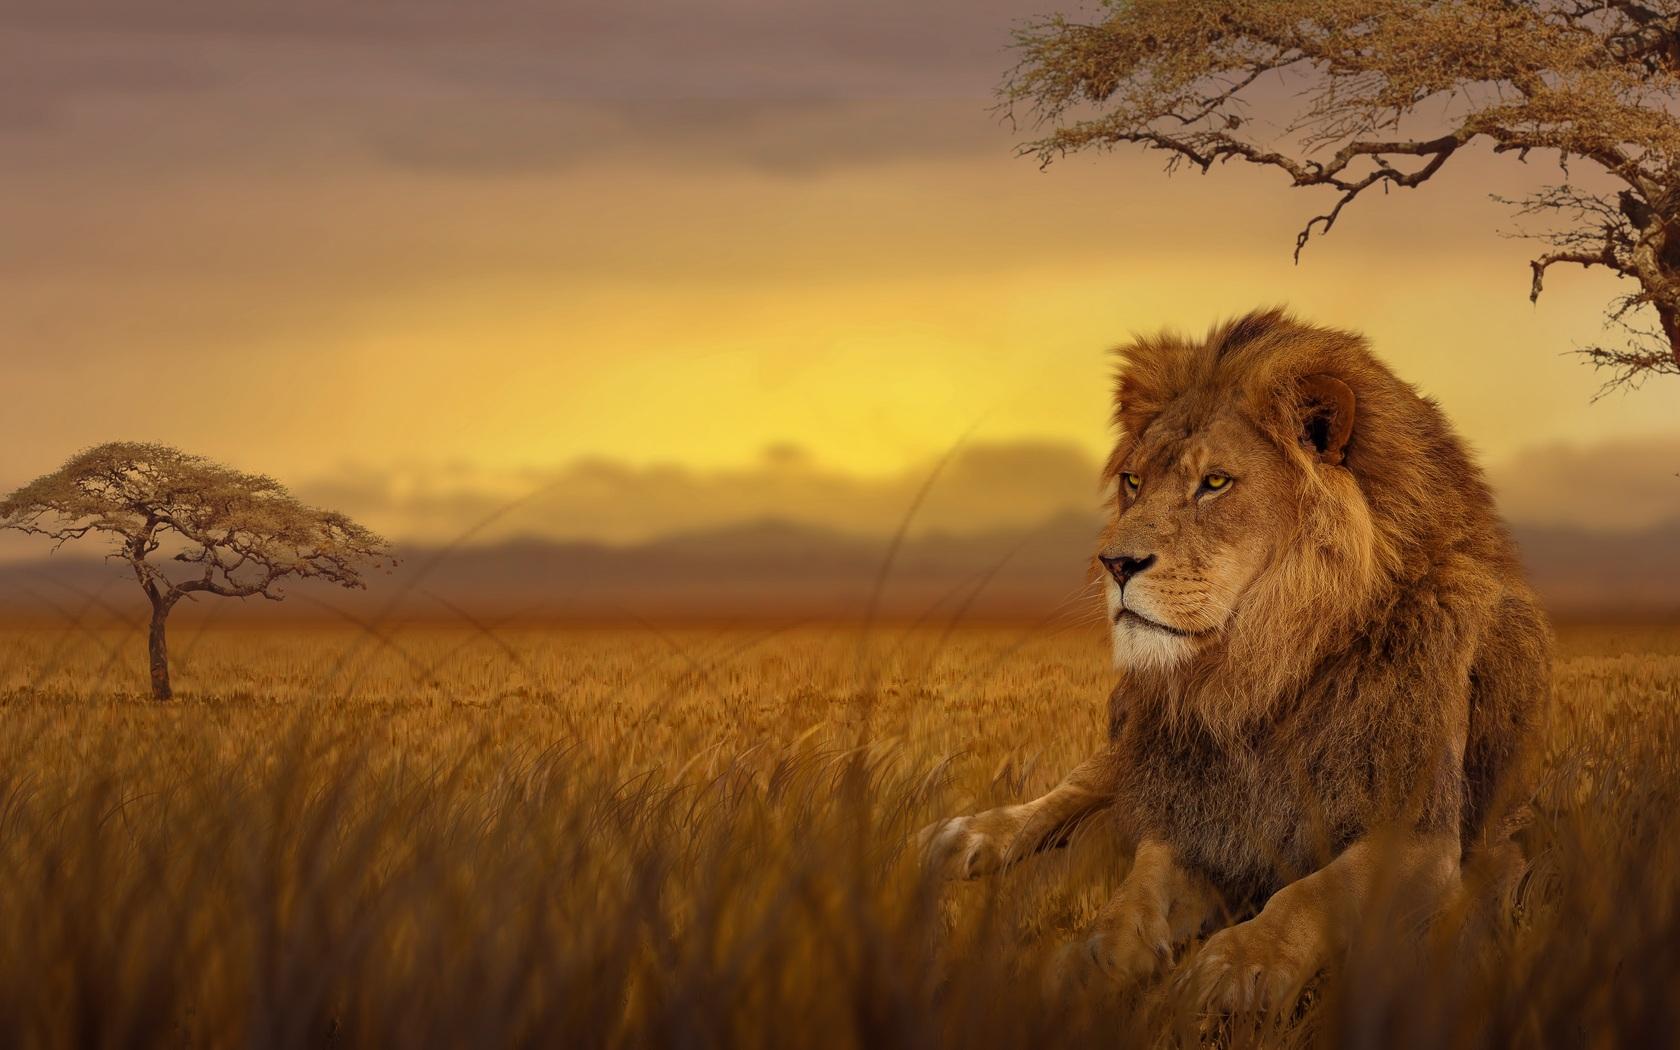 lion-forest-5k-0v.jpg